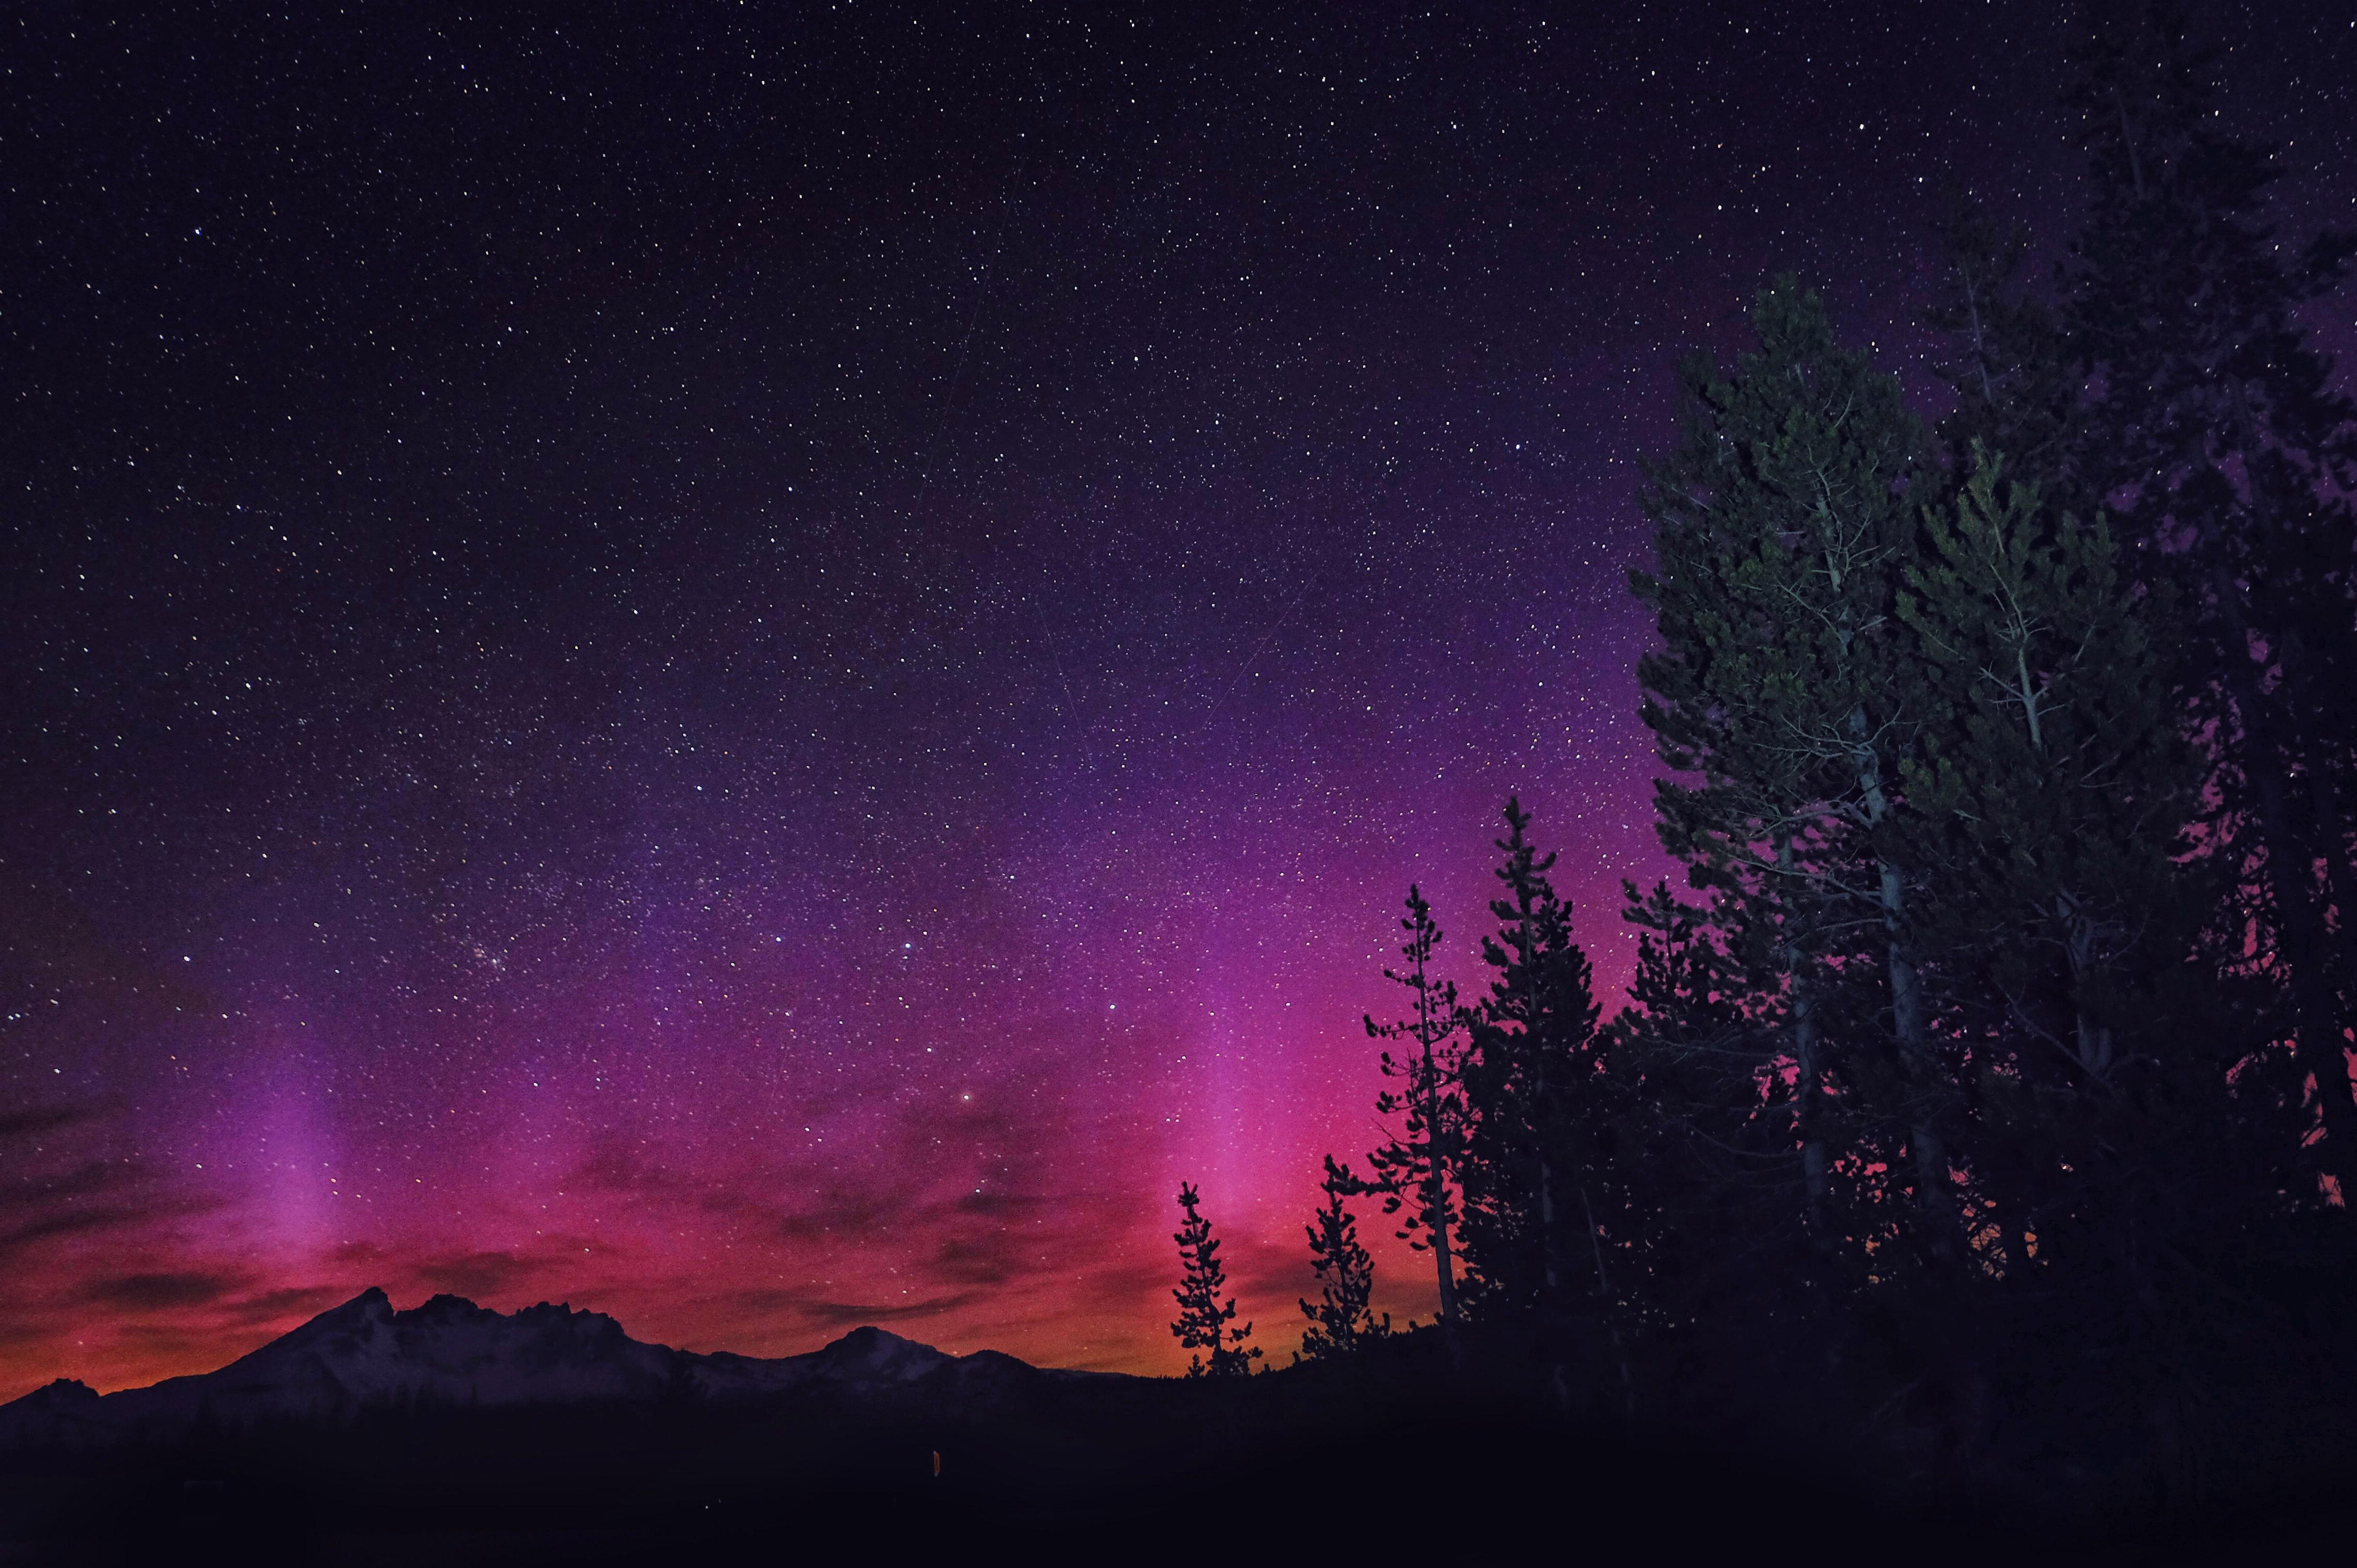 1400x1050 Northern Lights 4k 1400x1050 Resolution Hd 4k